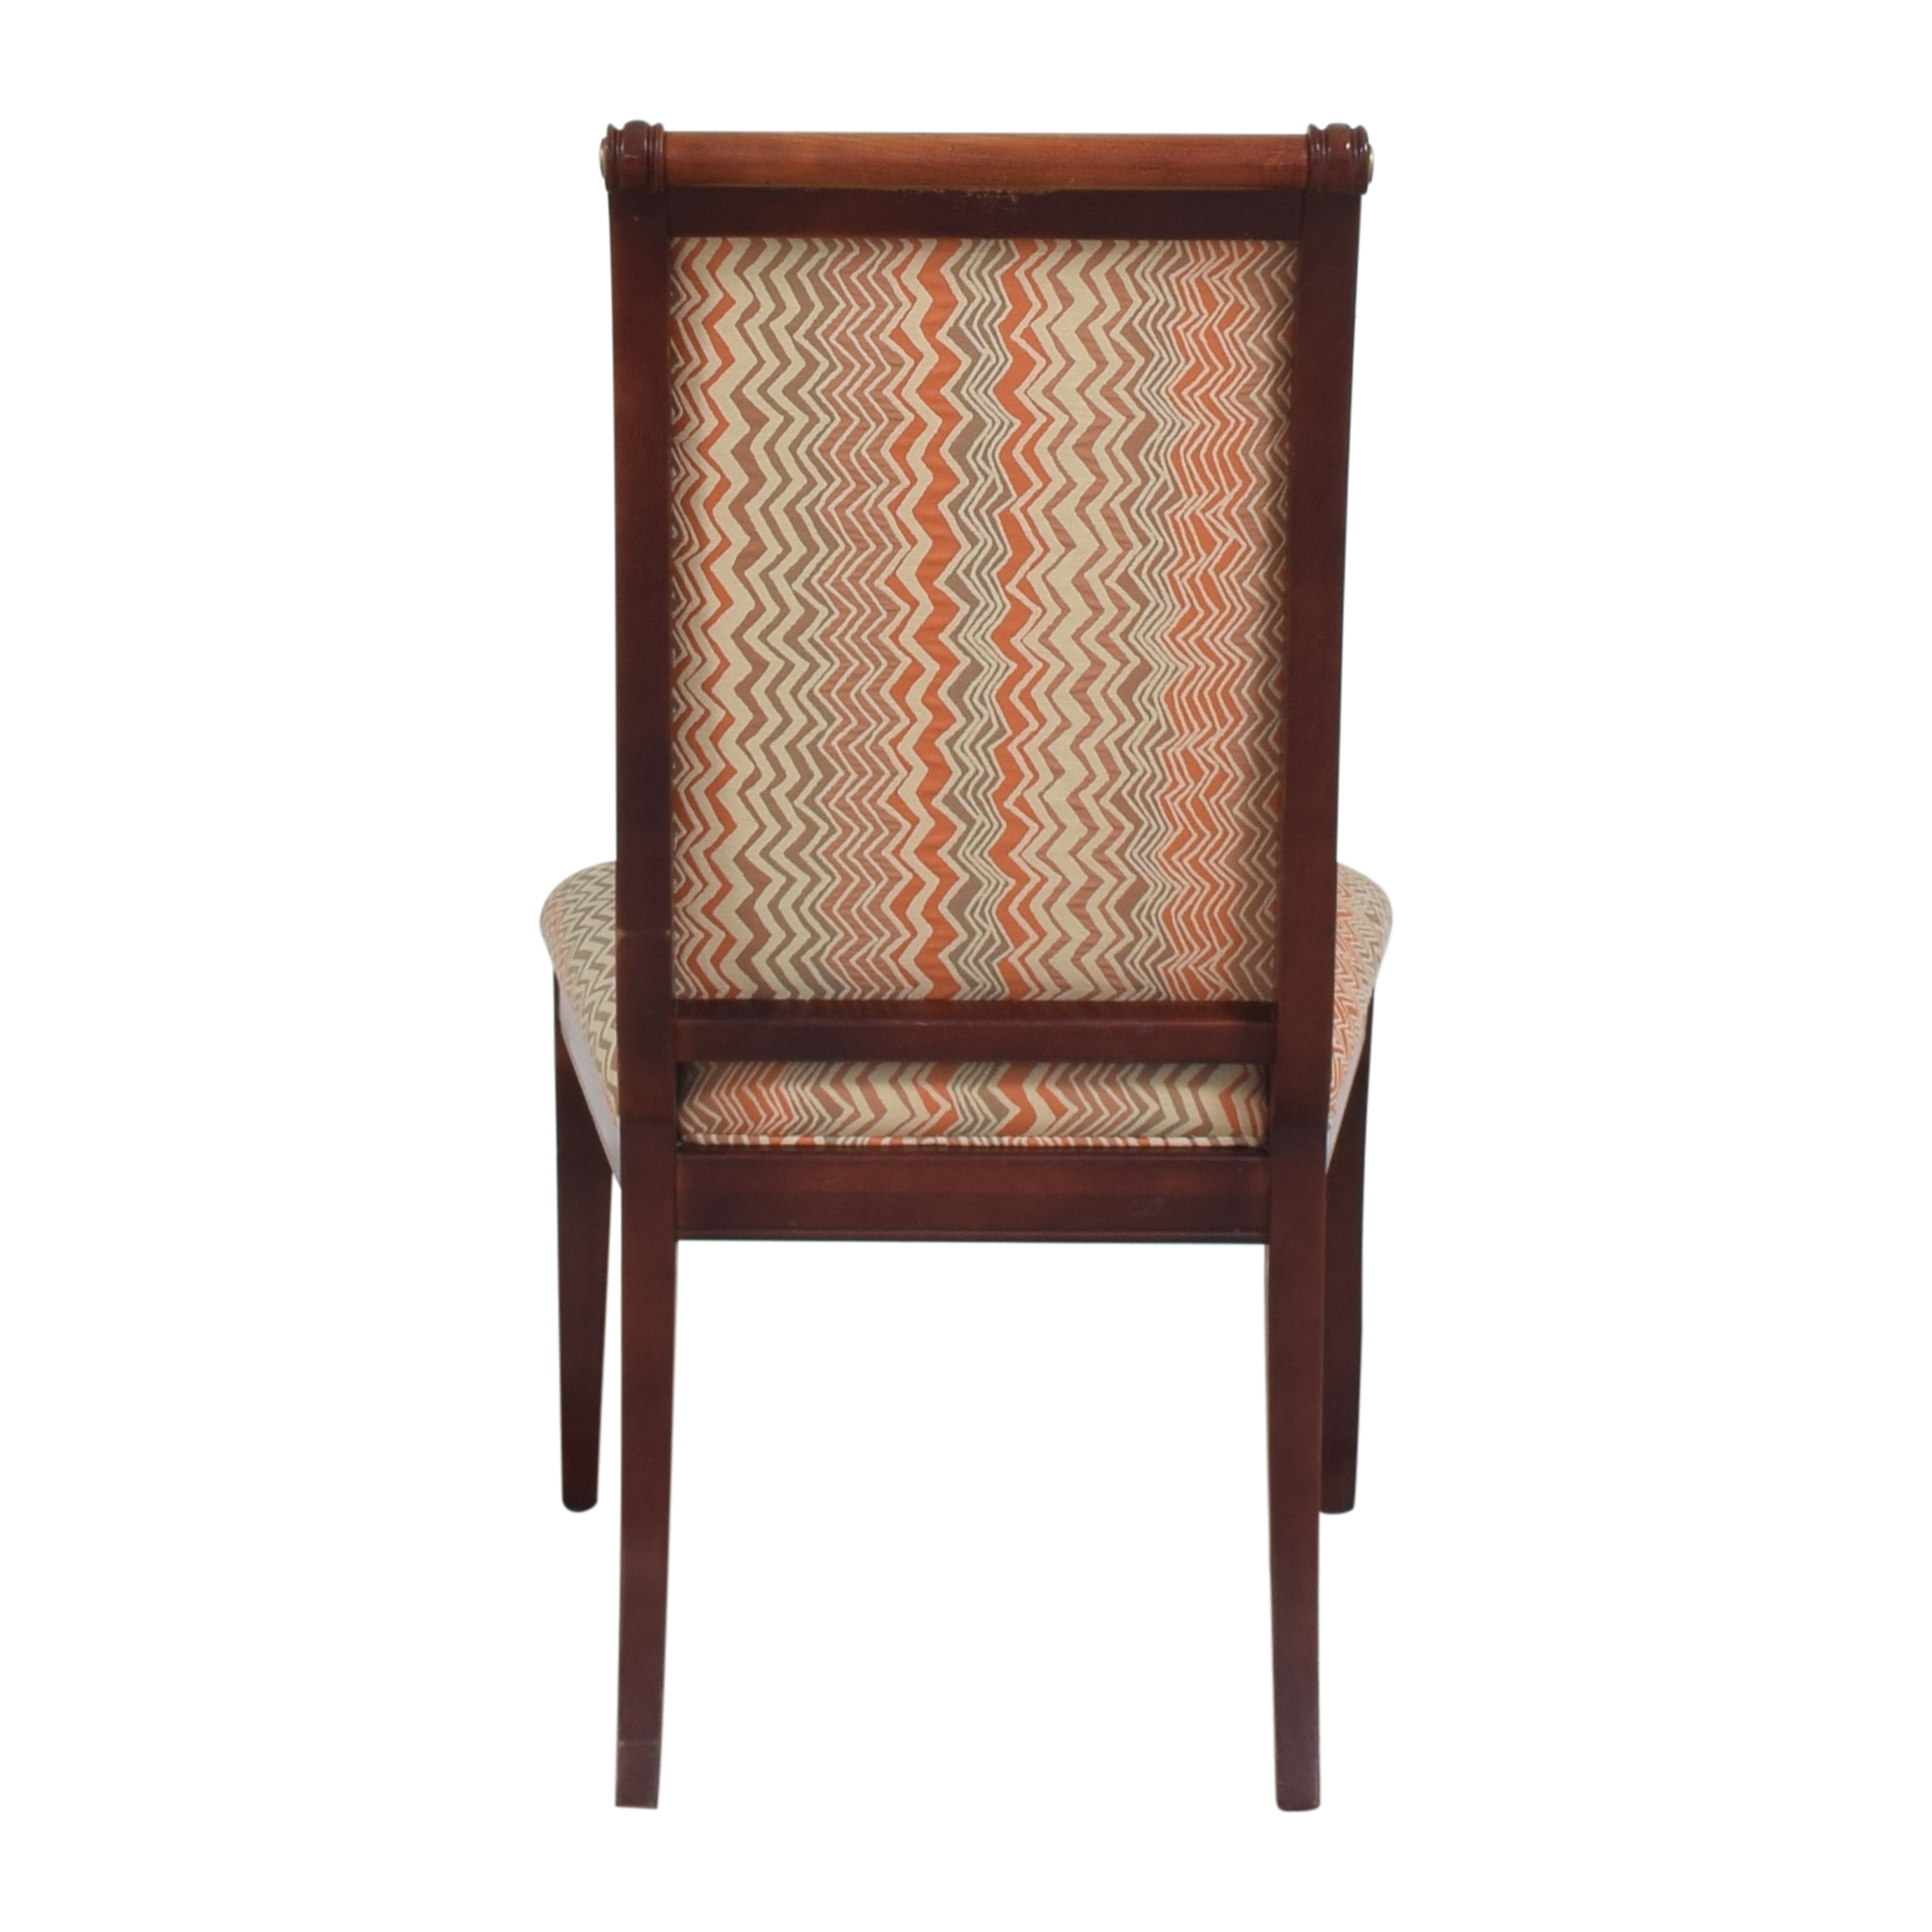 Ethan Allen Ethan Allen Dining Side Chair dimensions